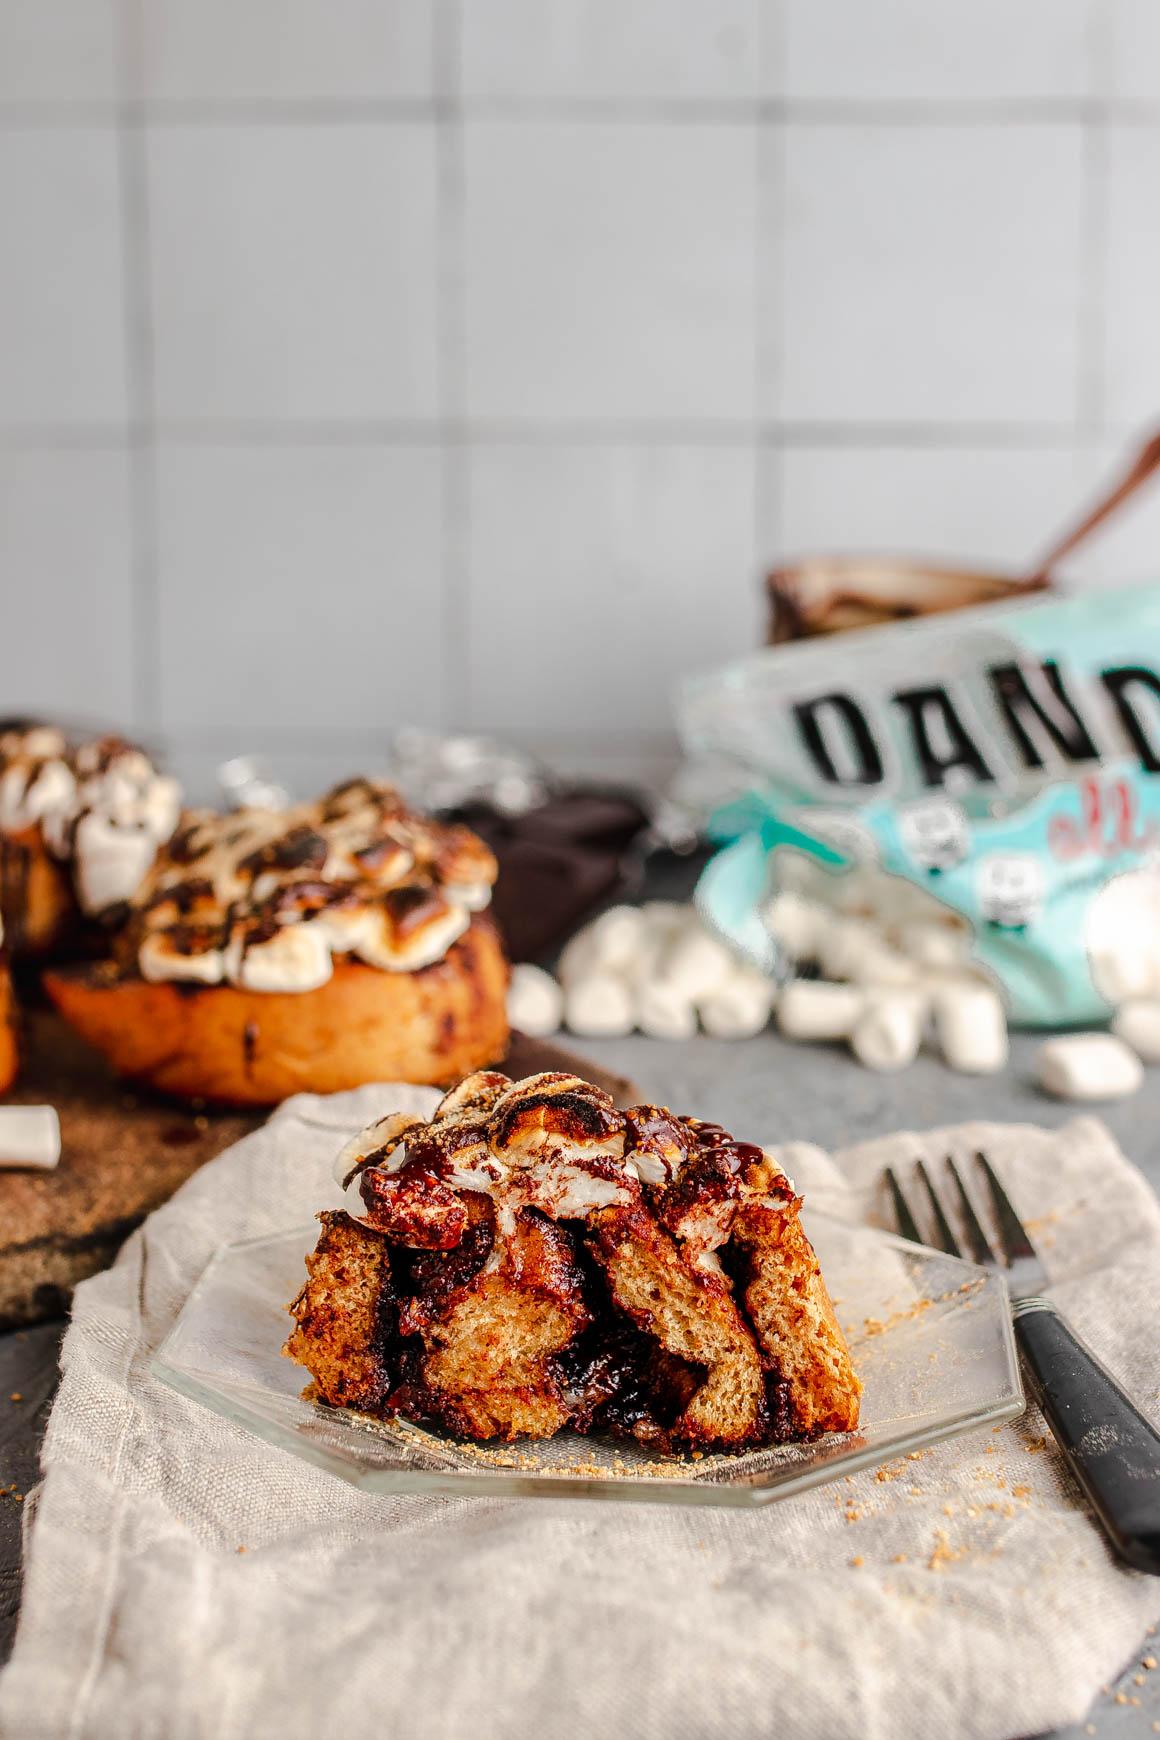 vegan s'mores cinnamon rolls cut in half